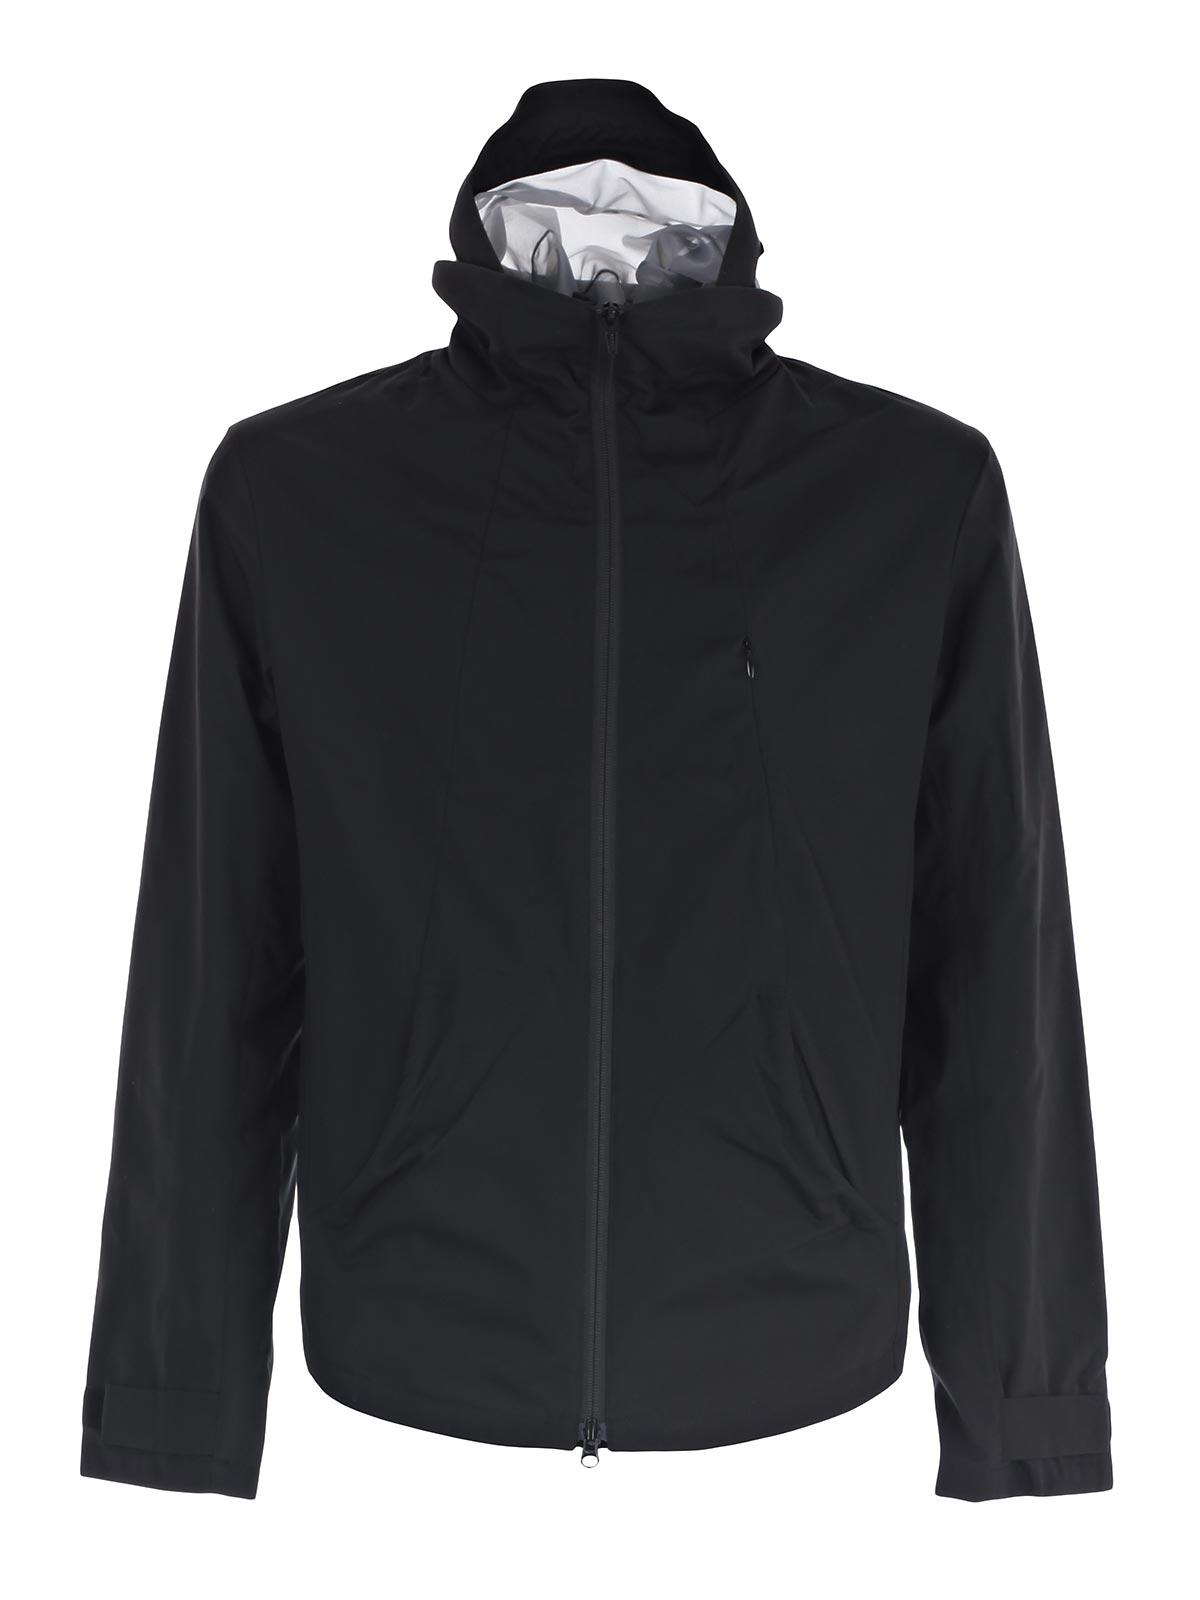 y 3 yohji yamamoto adidas jacket br1709 black bernardelli store